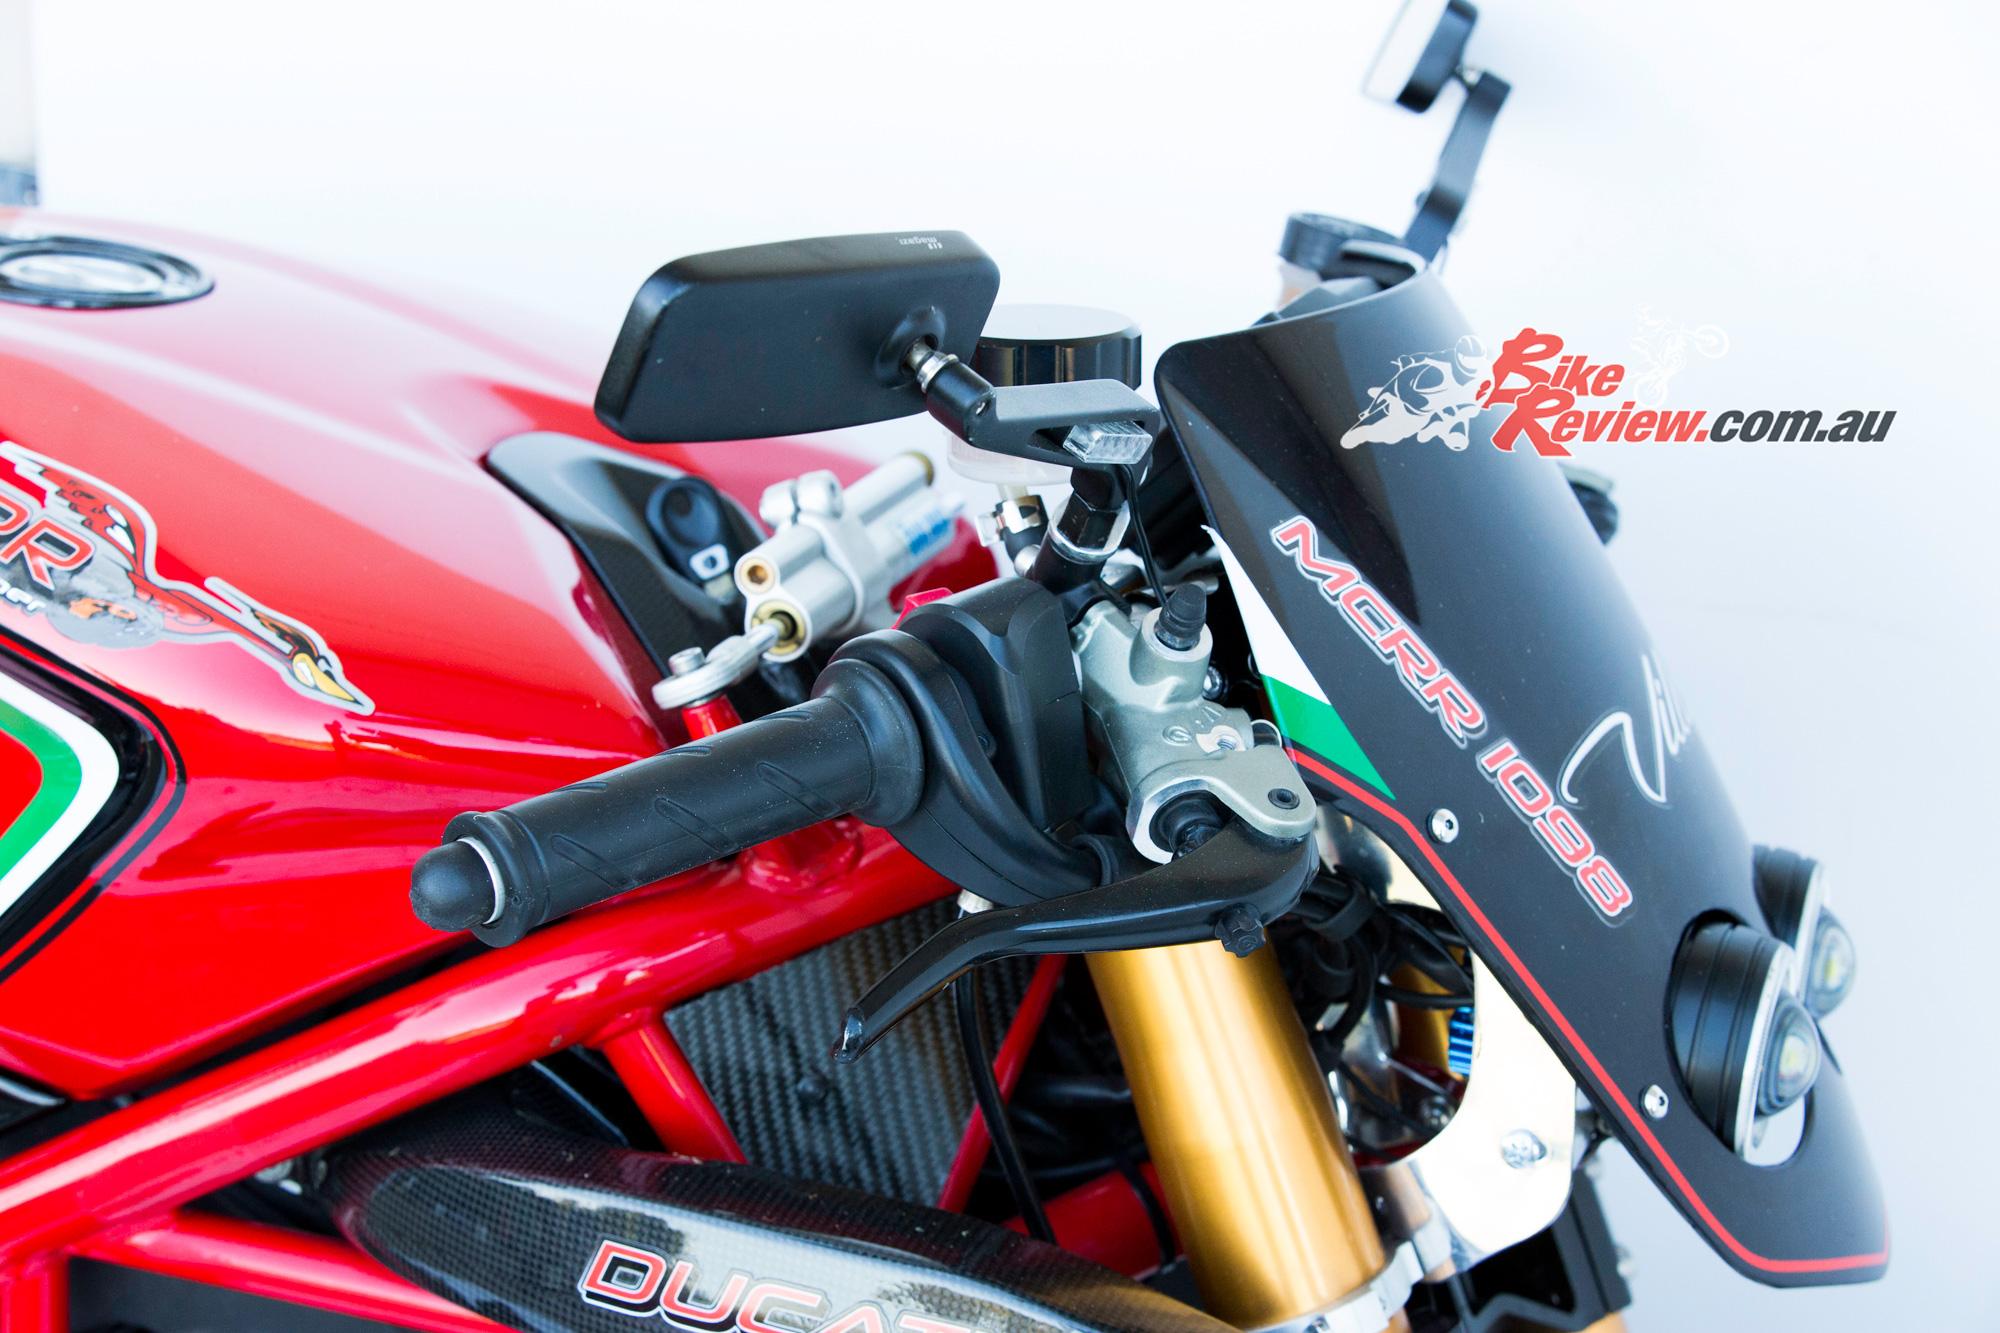 Custom: 1098 MC RR Ducati Fighter - Bike Review